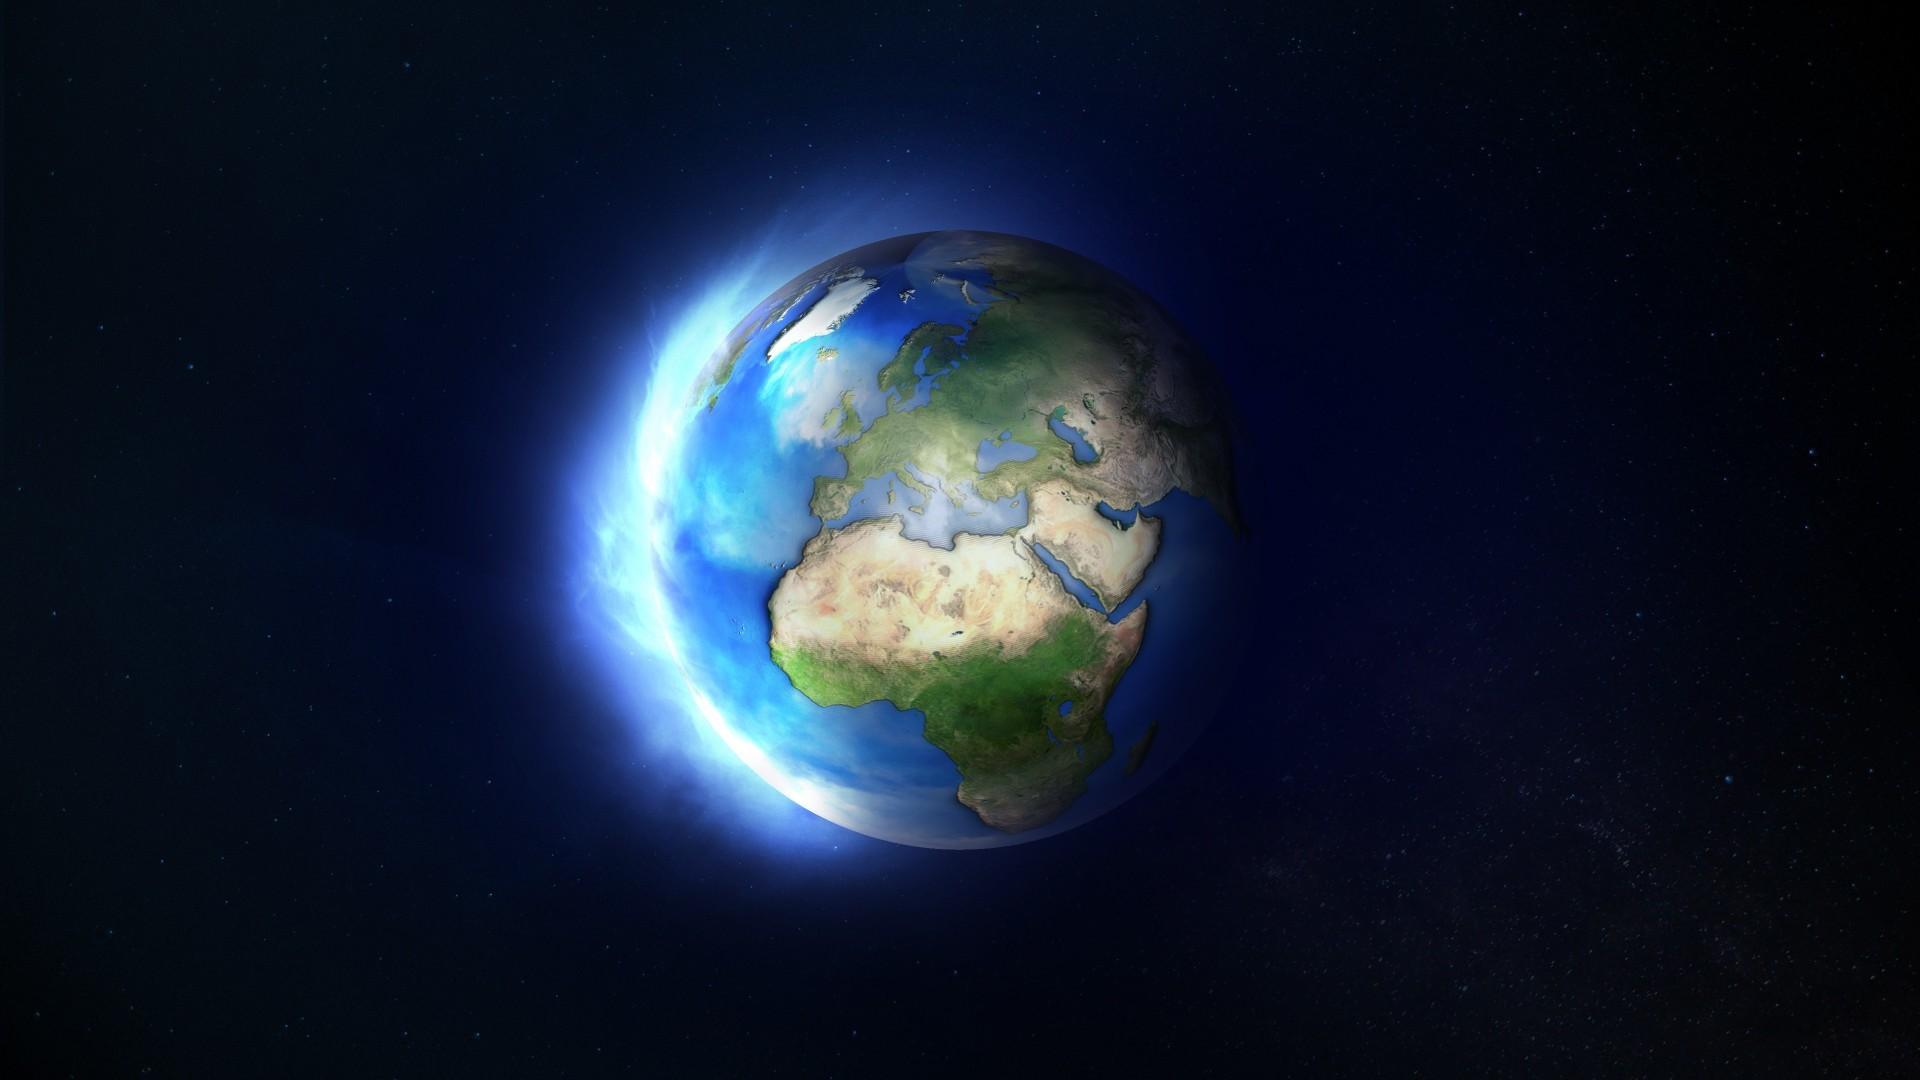 Space / Earth Wallpaper